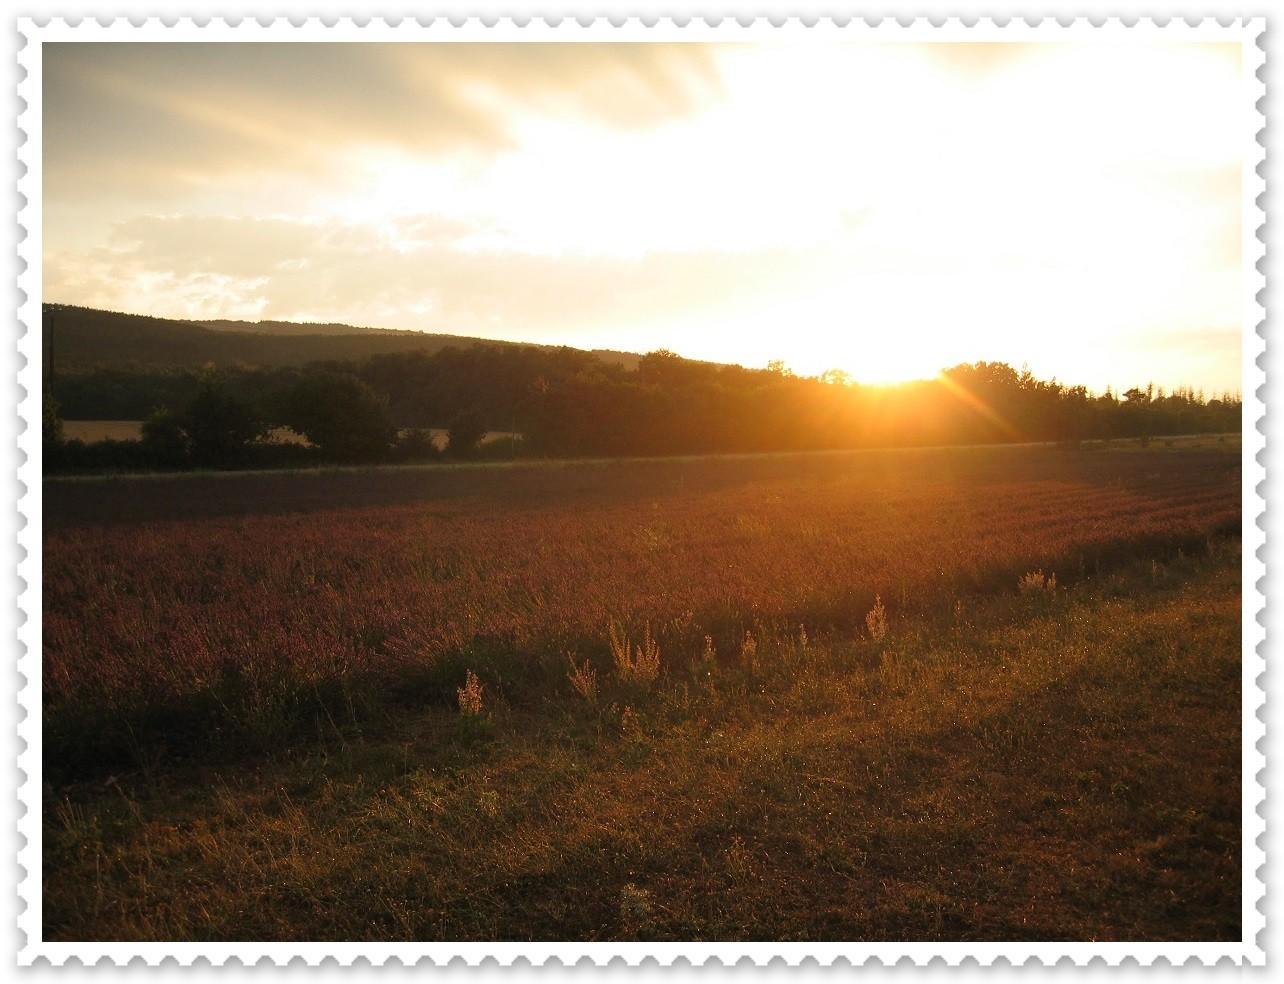 Sonnenuntergang über einem Lavandin-Feld